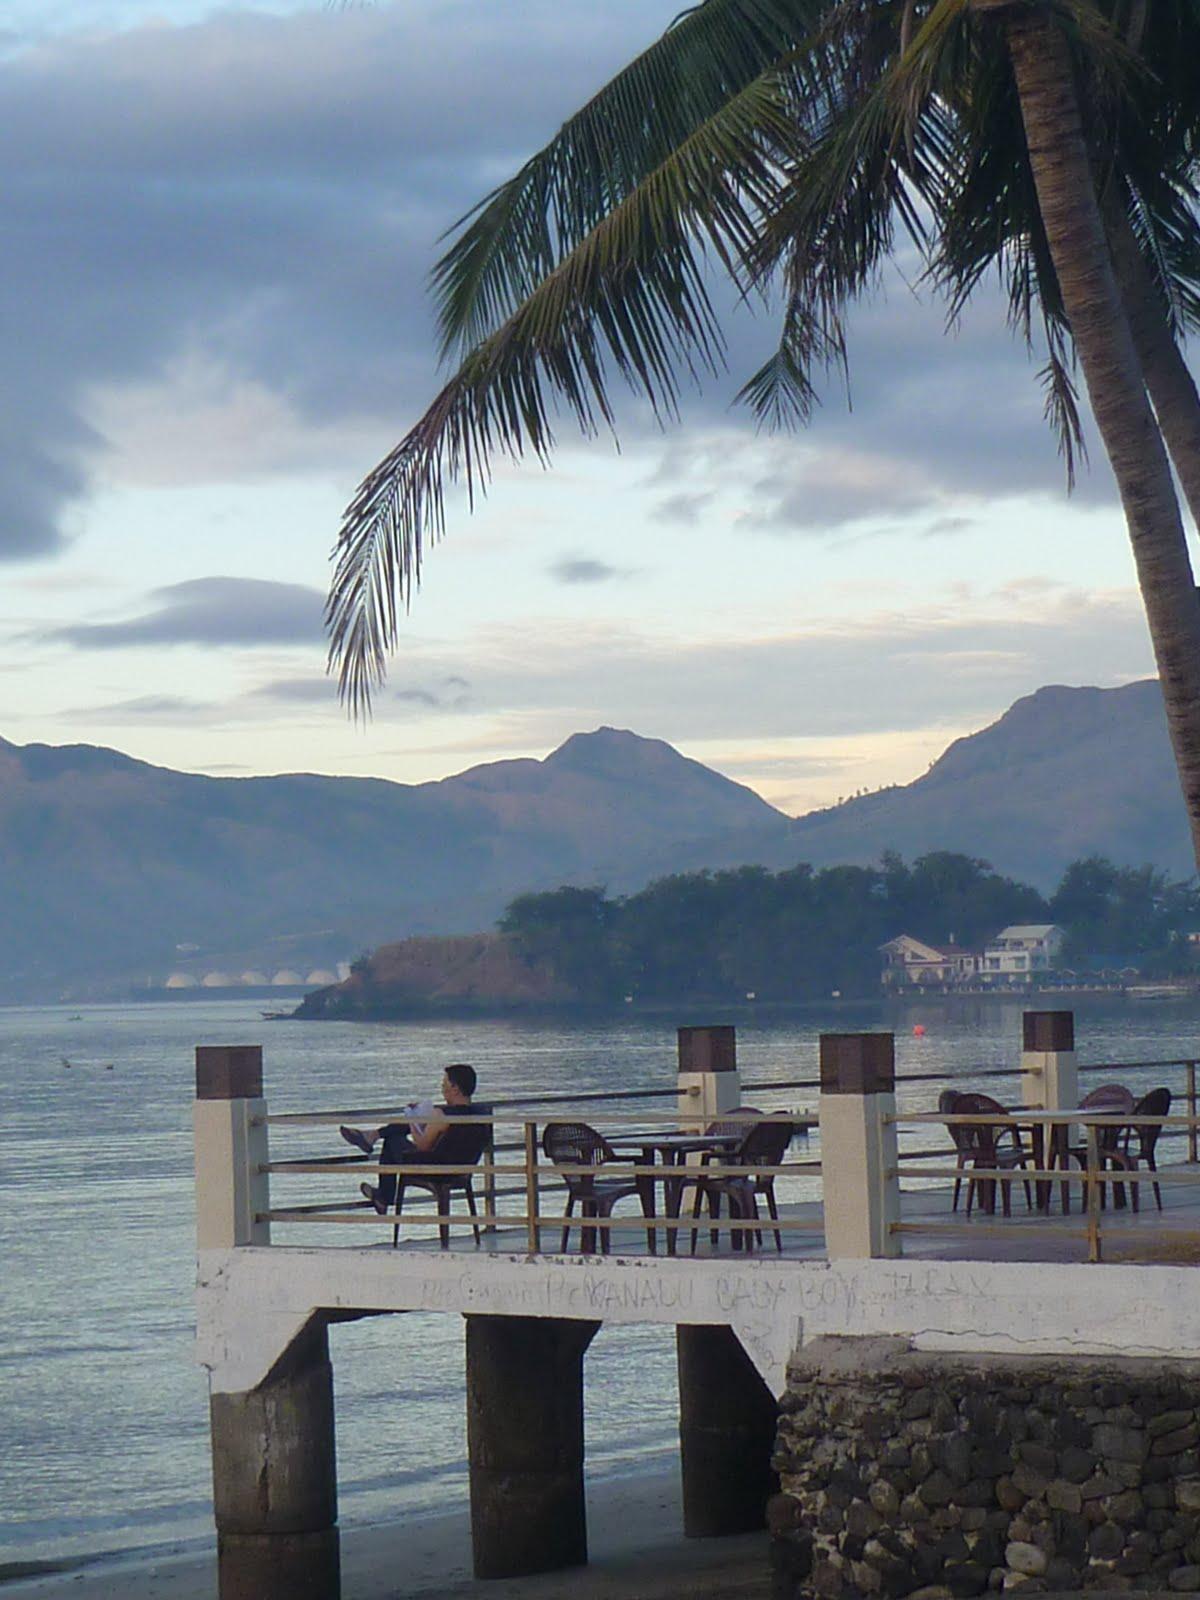 travels of joy grand seas resort olongapo city. Black Bedroom Furniture Sets. Home Design Ideas